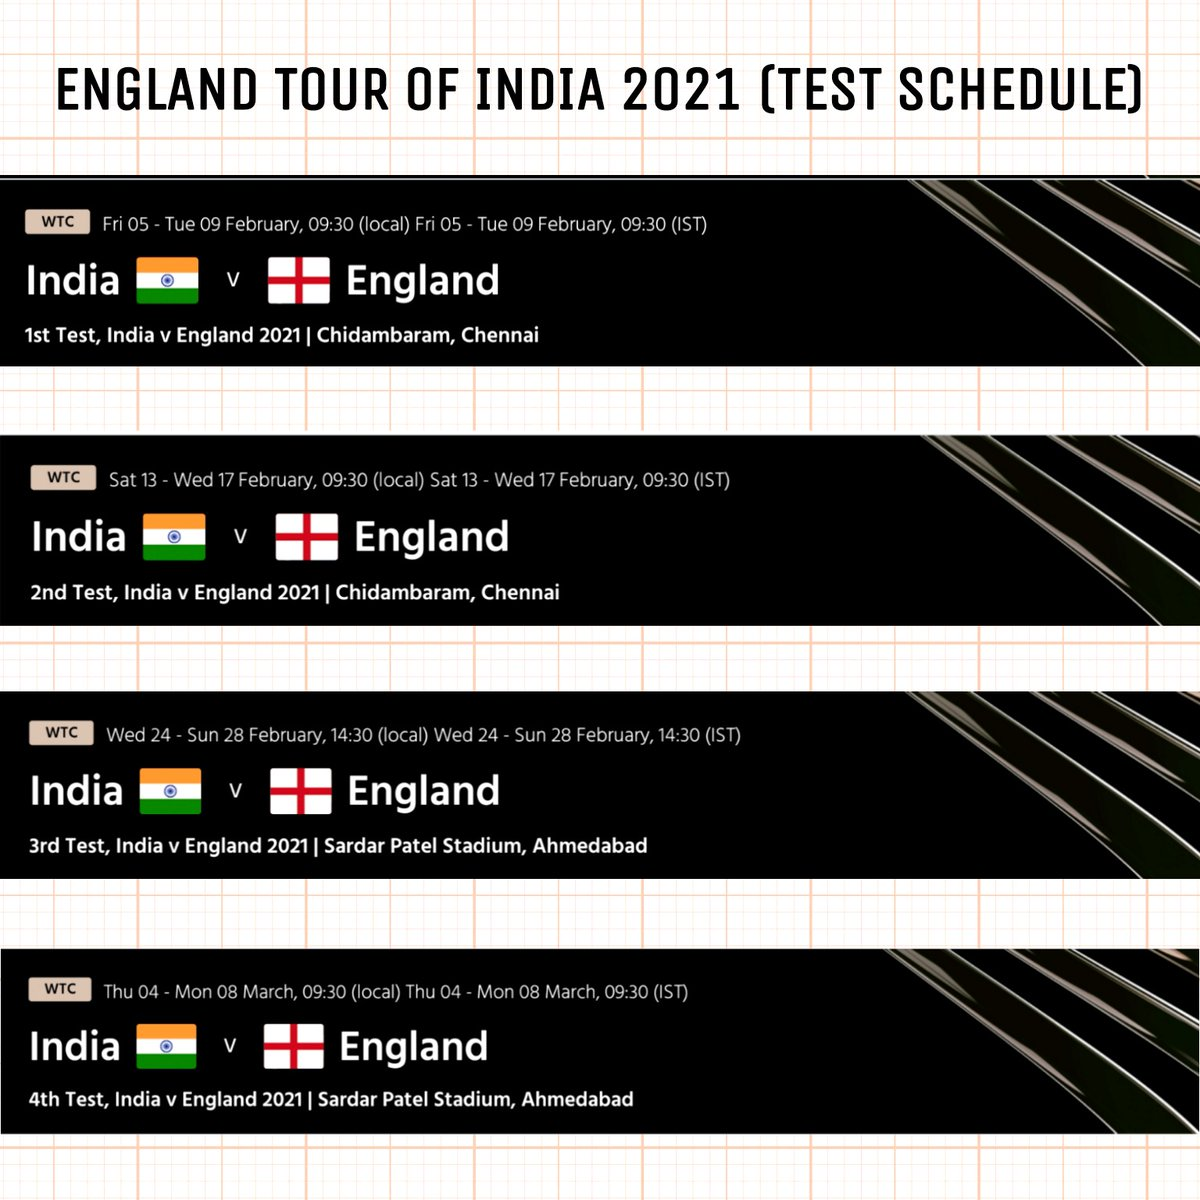 England Tour of India 1947😂  Full match shedule. #india #icc #BCCI #ipl #ipl2021 #iplauction #india #teamindia #INDvsAUS #viratkoh #RohitSharma #indiancricketteam #cricket #cricketnews #breakingnews #joeroot #republicday #engvssl #ENGvsSL #england #shubmangill #POSCO